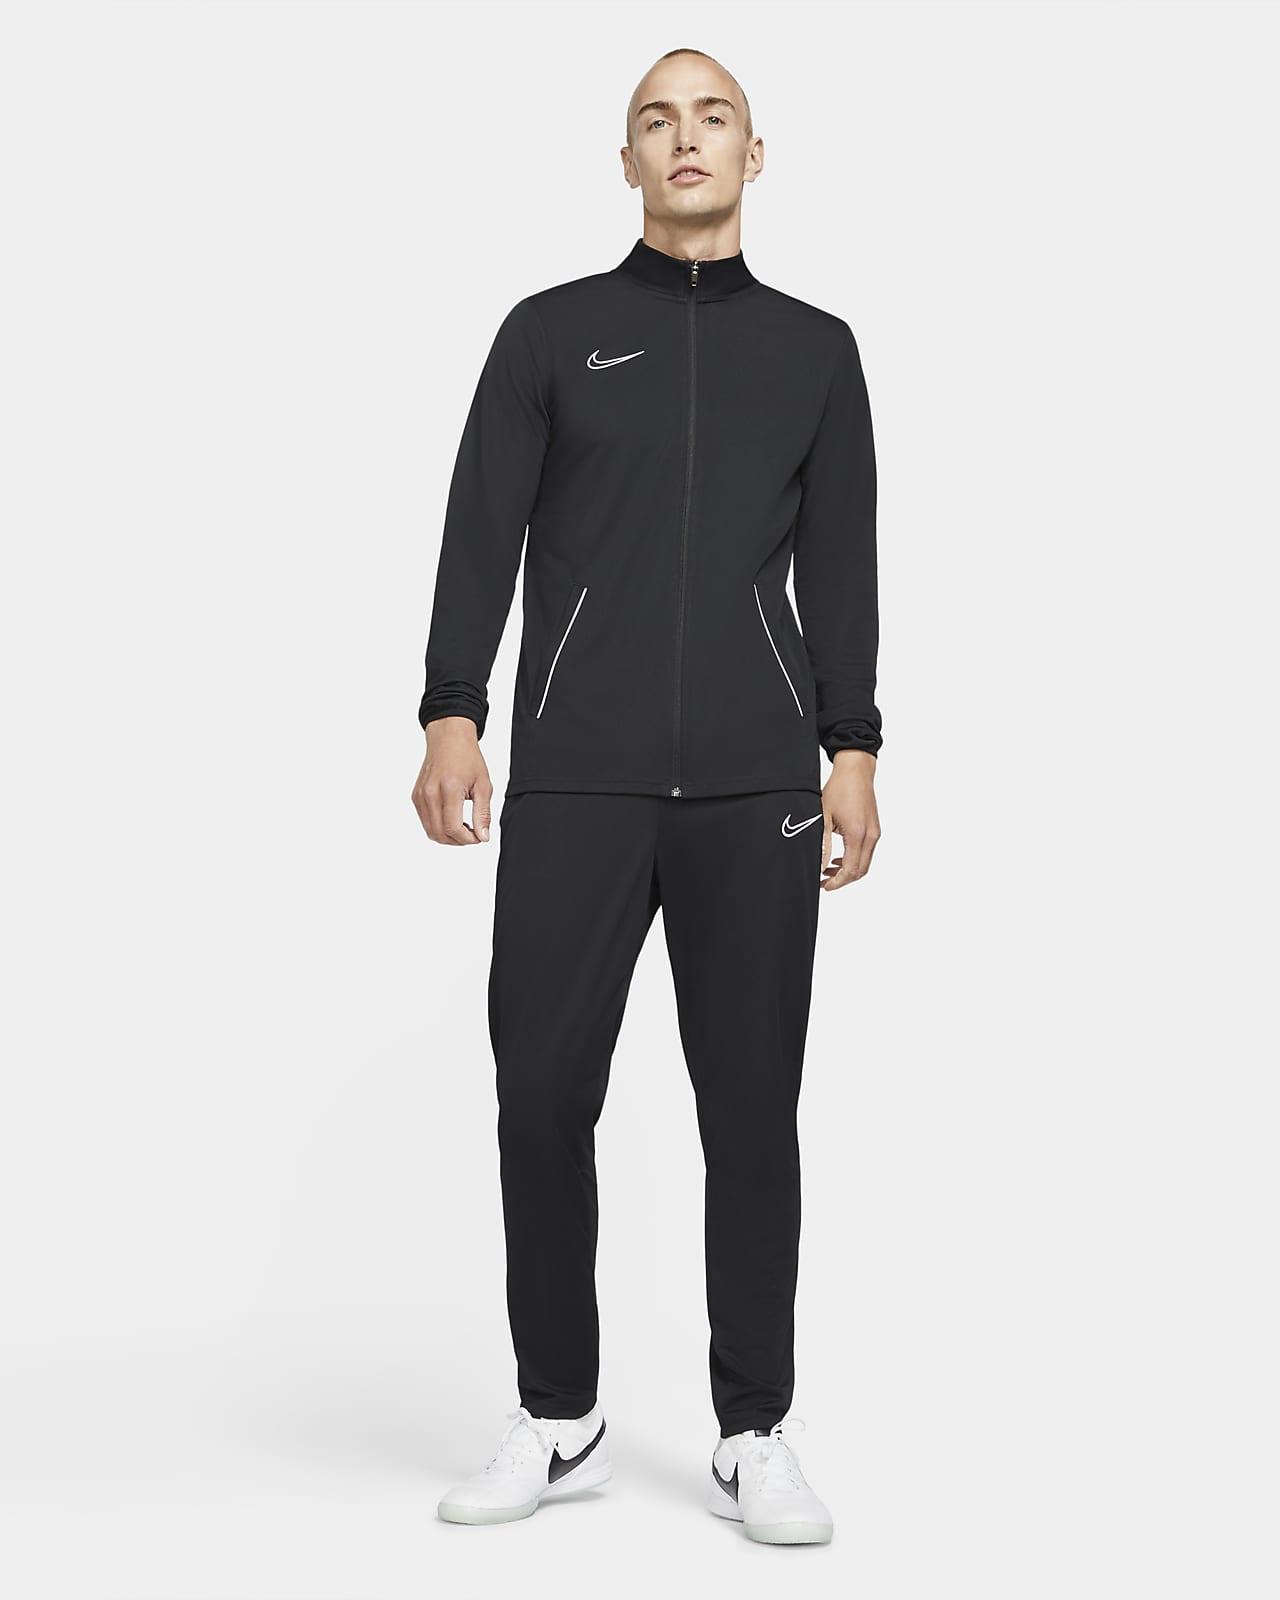 Nike Dri-FIT Academy Men's Knit Soccer Tracksuit